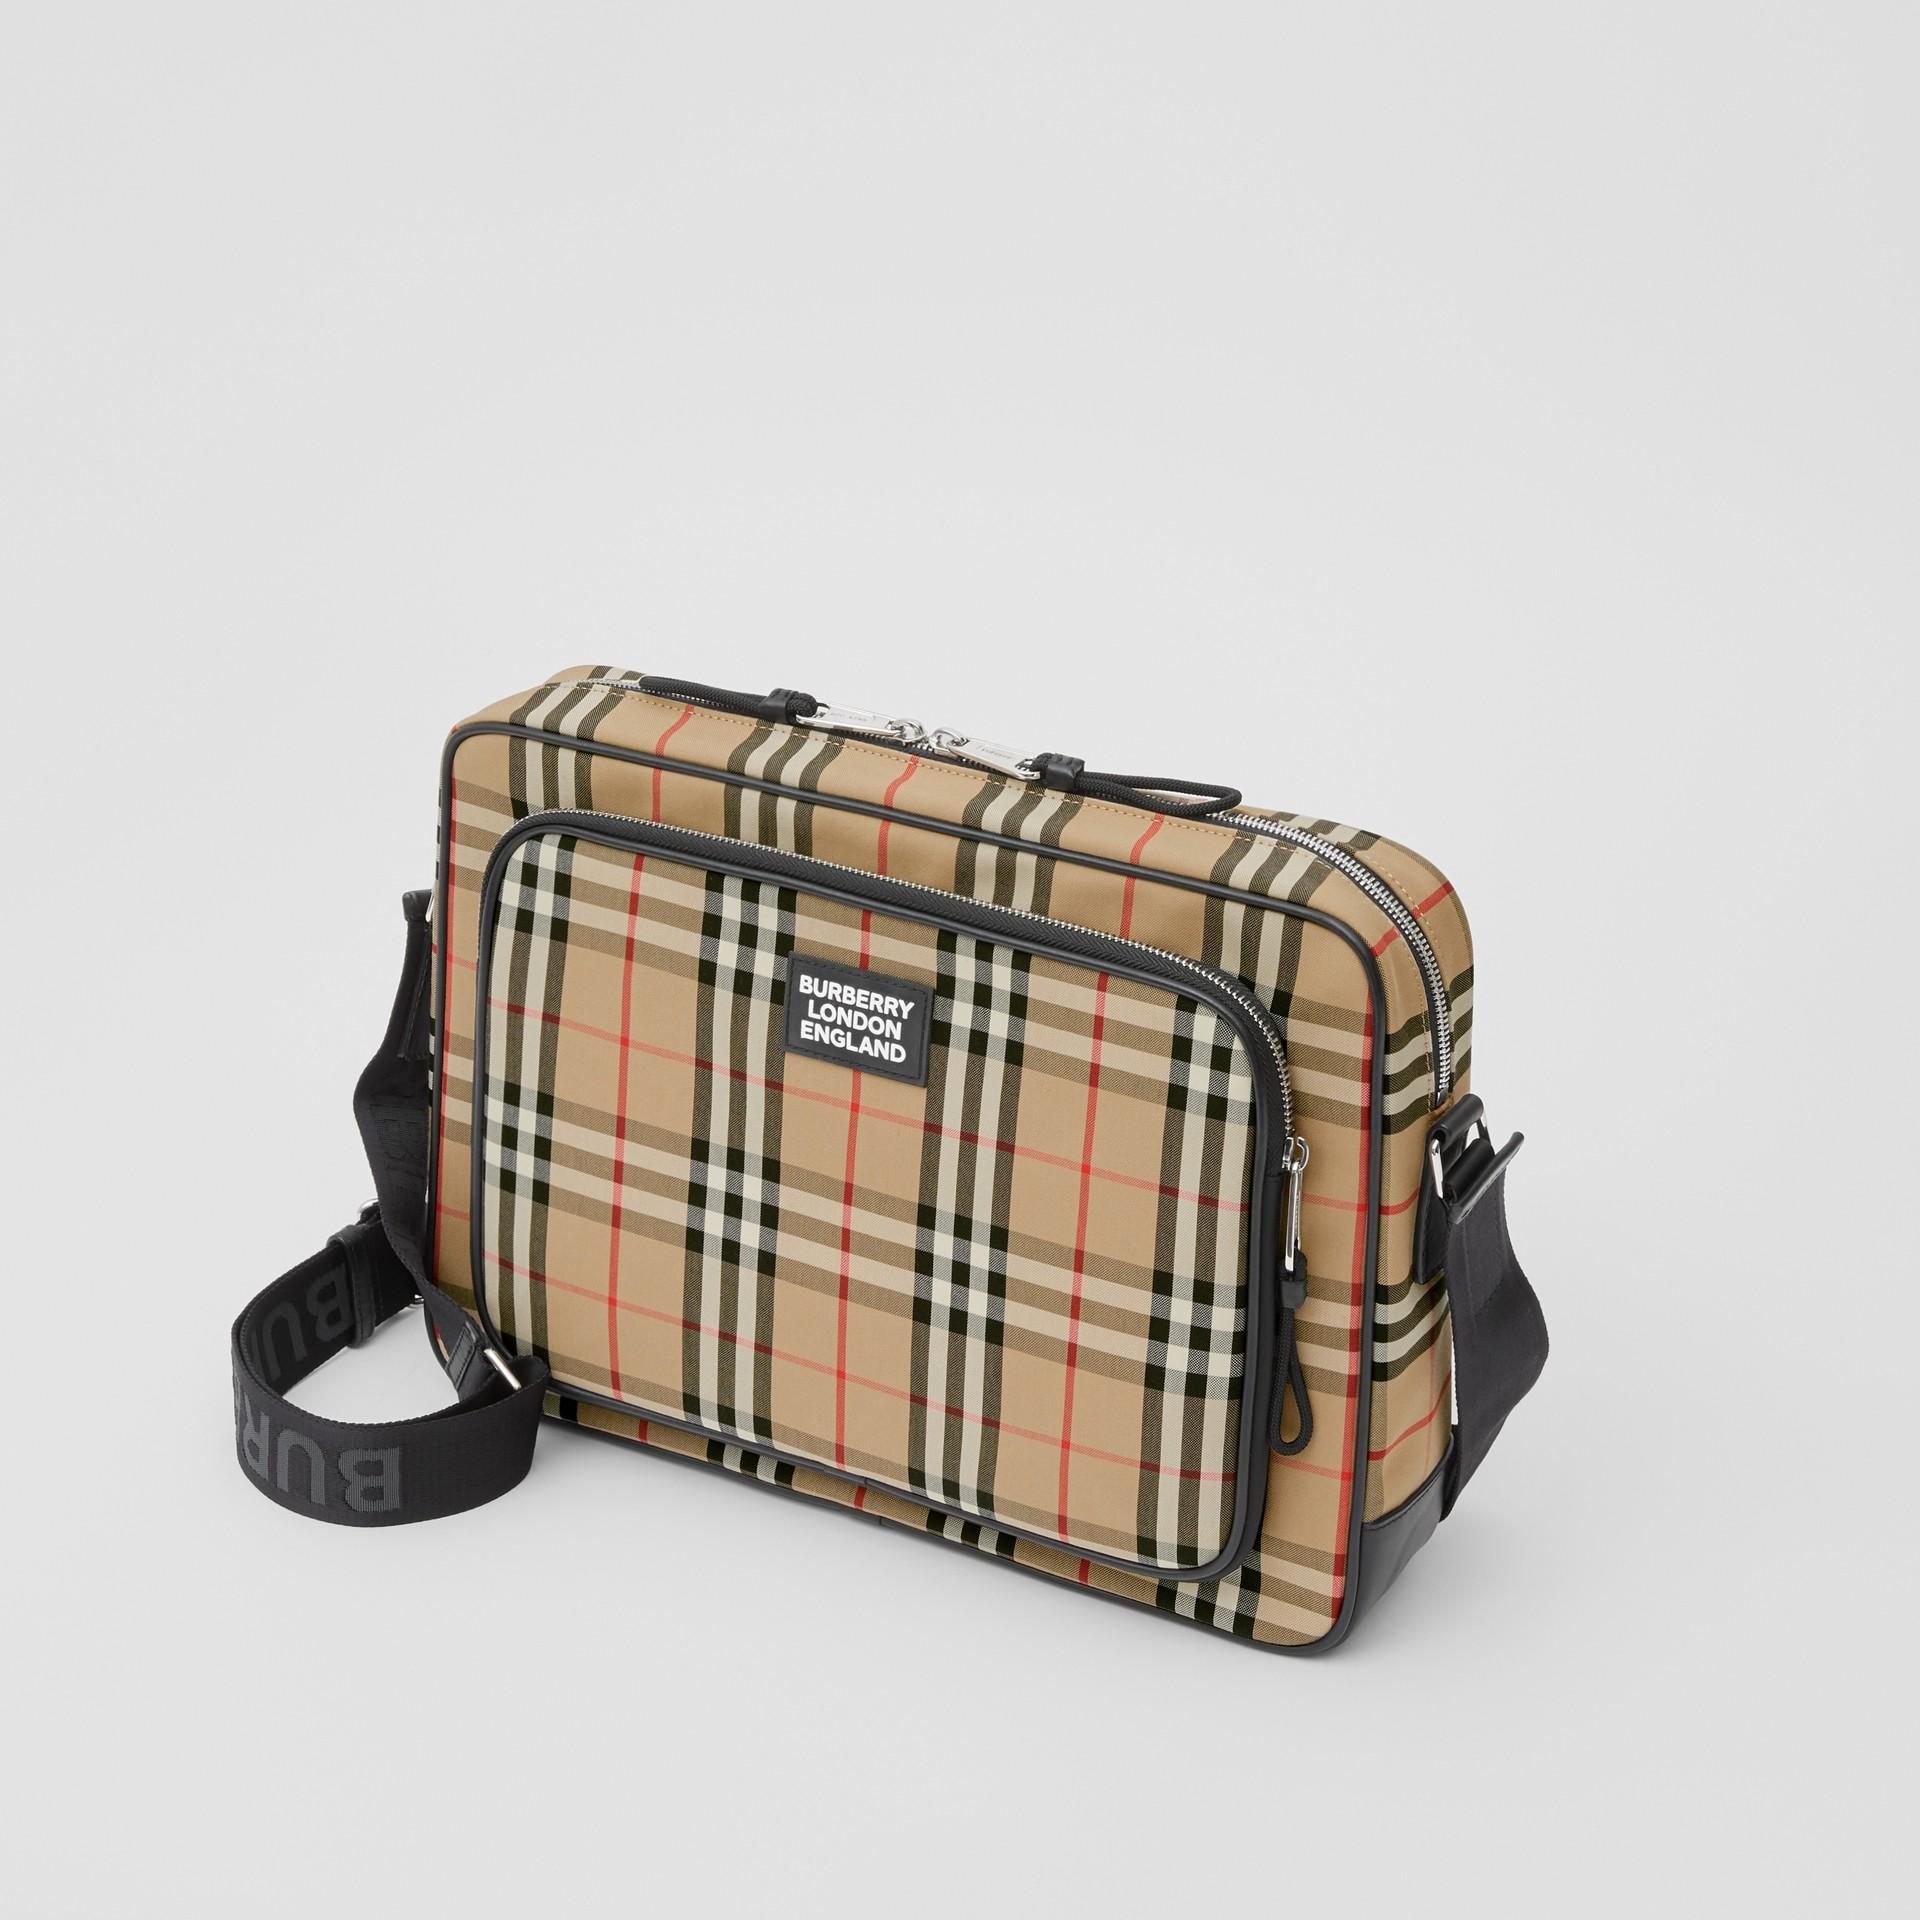 Vintage Check Cotton Messenger Bag in Archive Beige - Men | Burberry - gallery image 3